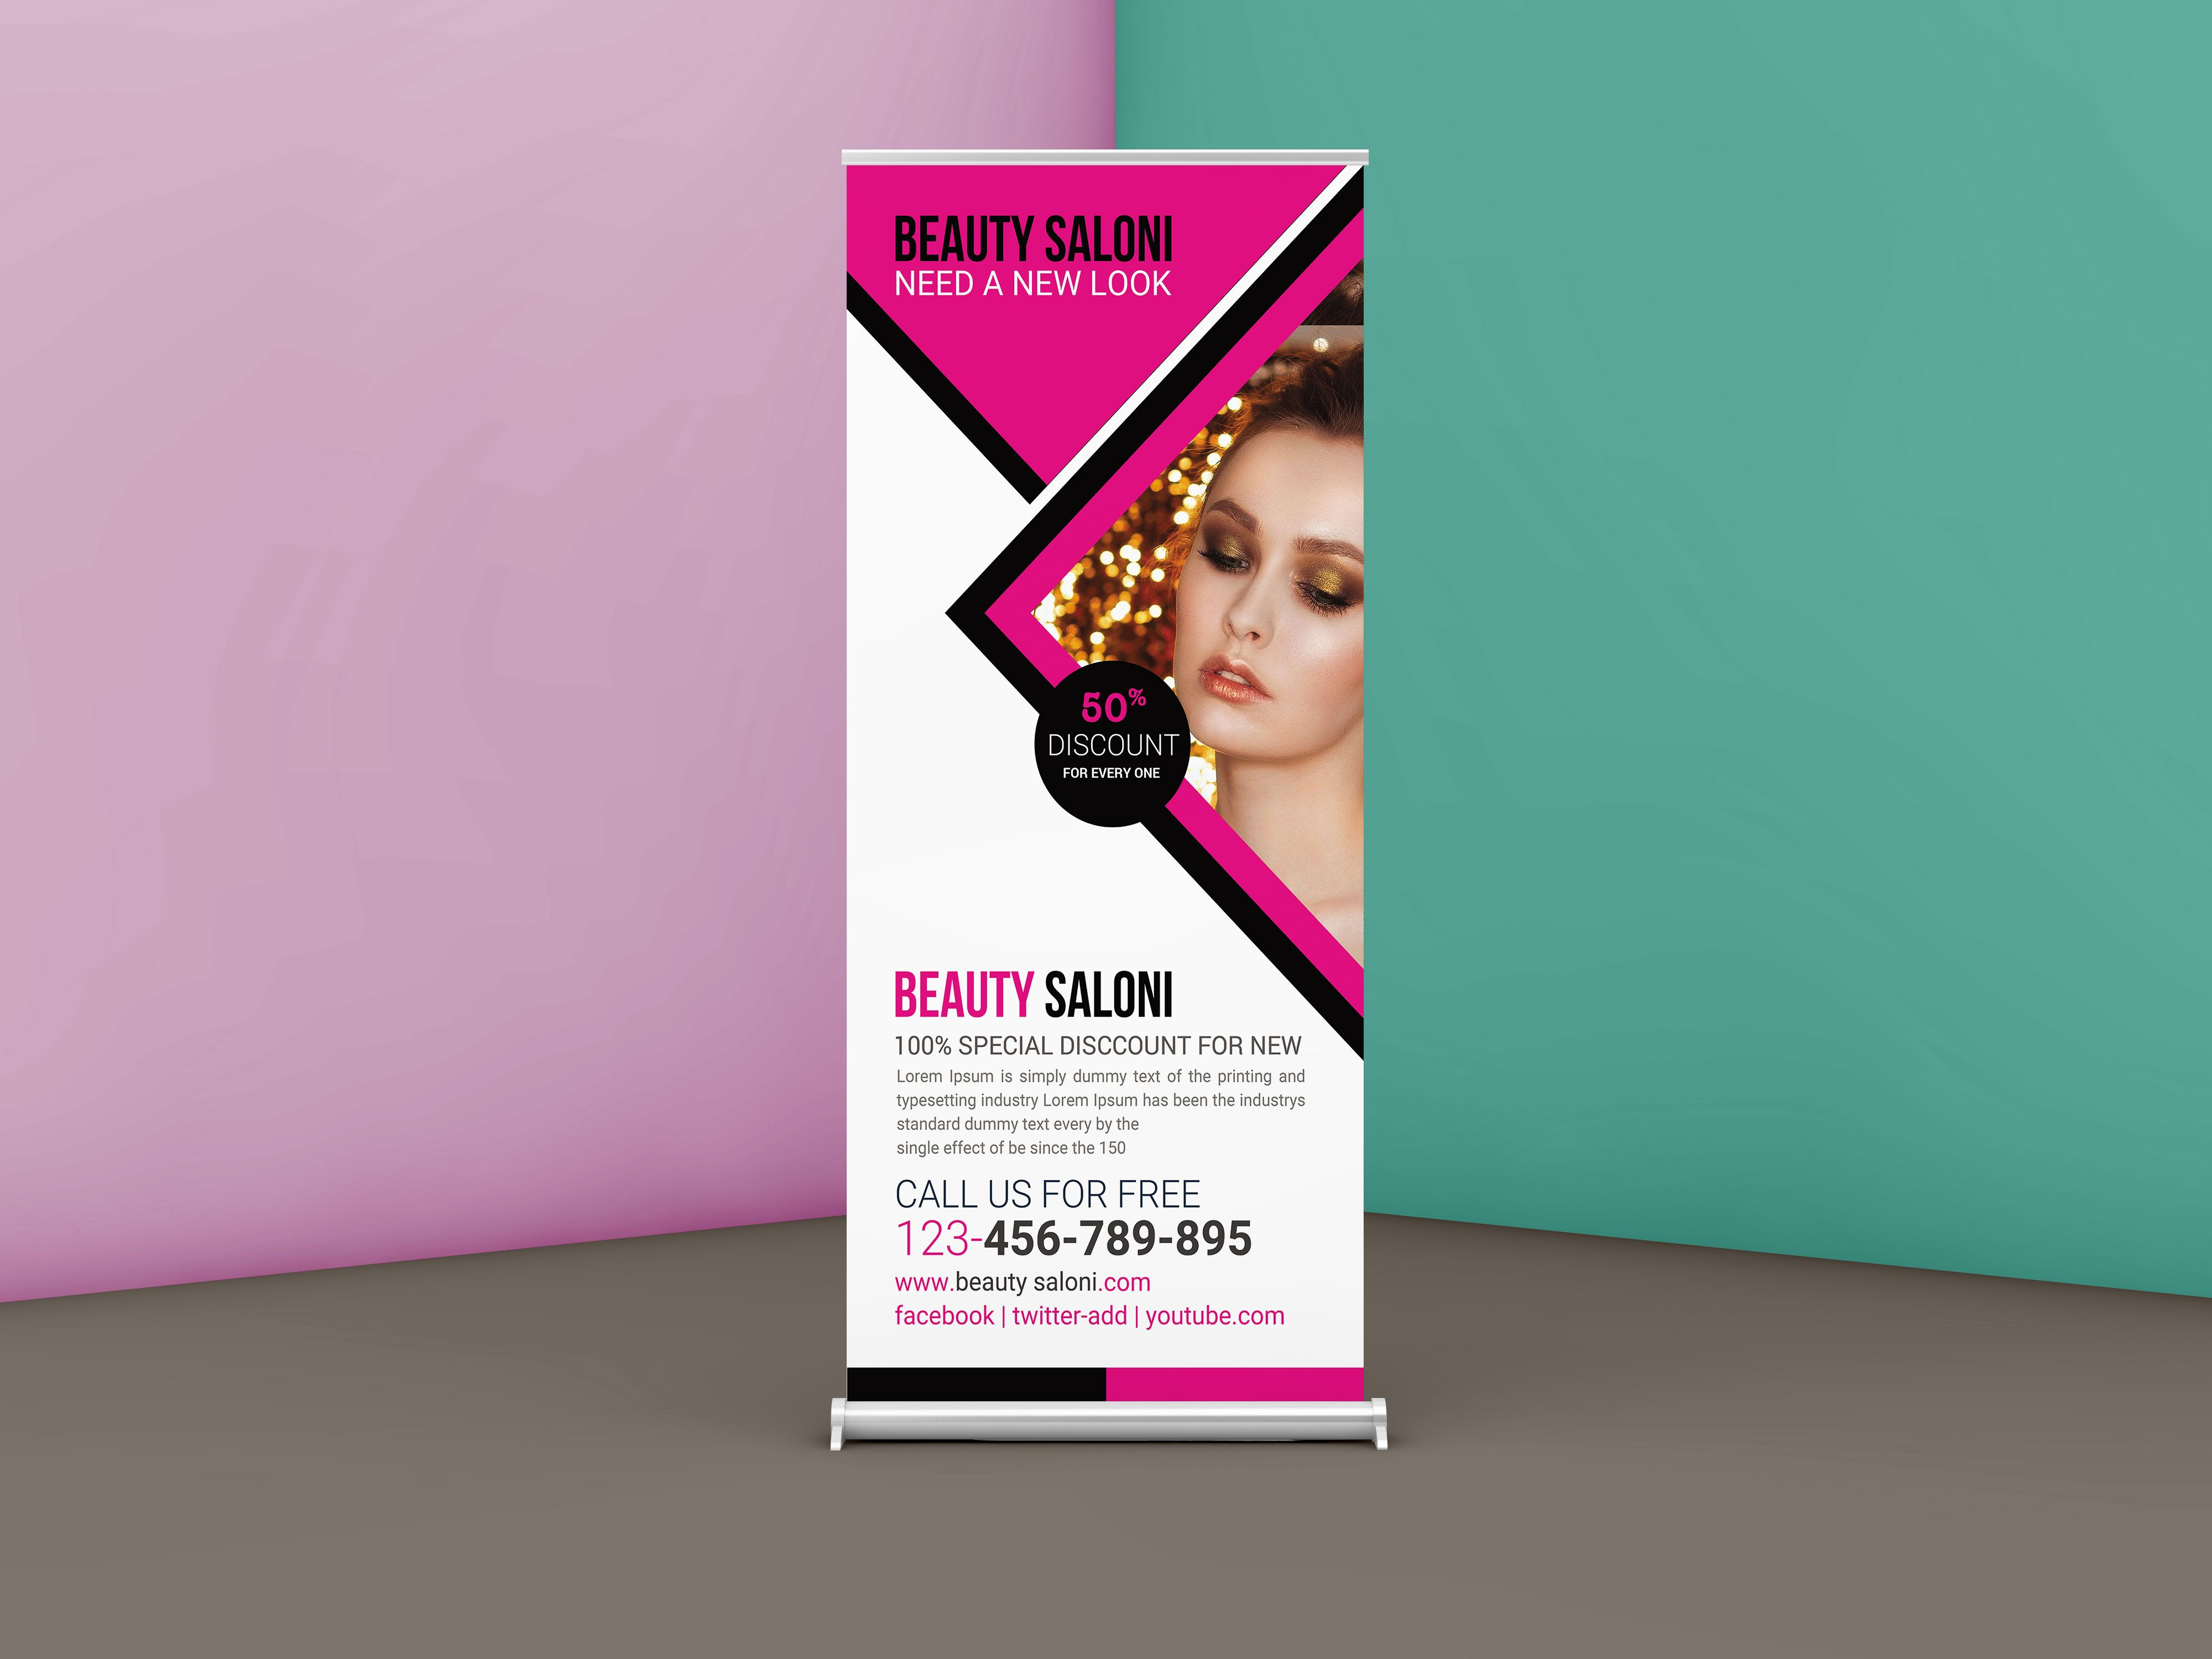 Free Beauty Salon Roll Up Banner Design Template Banner Bannerpsd Banner Template Download Do Banner Template Design Banner Design Graphic Designer Ideas